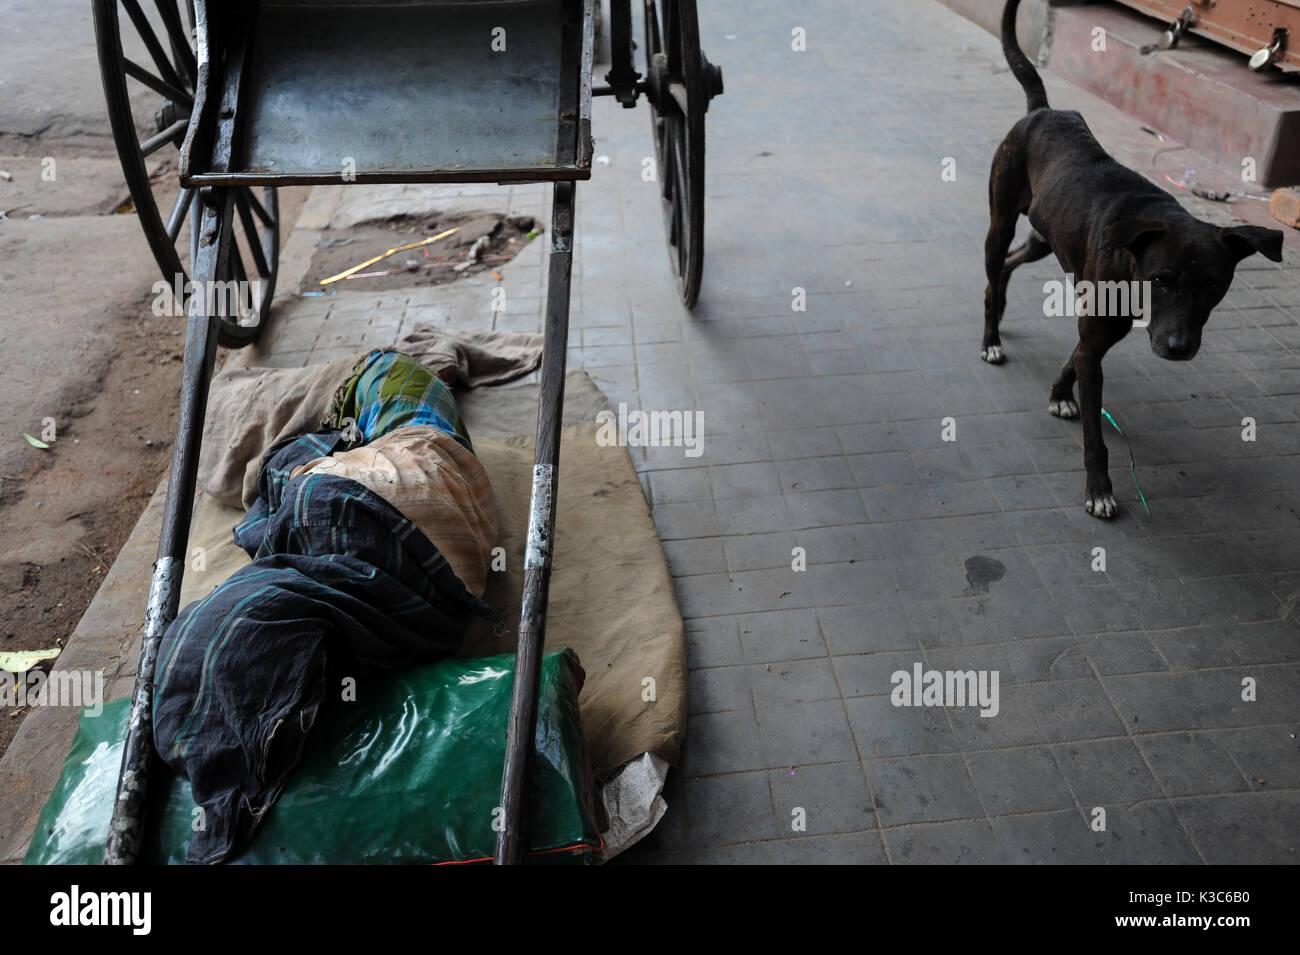 04.12.2011, Kolkata, West Bengal, India, Asia - A rickshaw puller sleeps next to his wooden rickshaw at a roadside - Stock Image